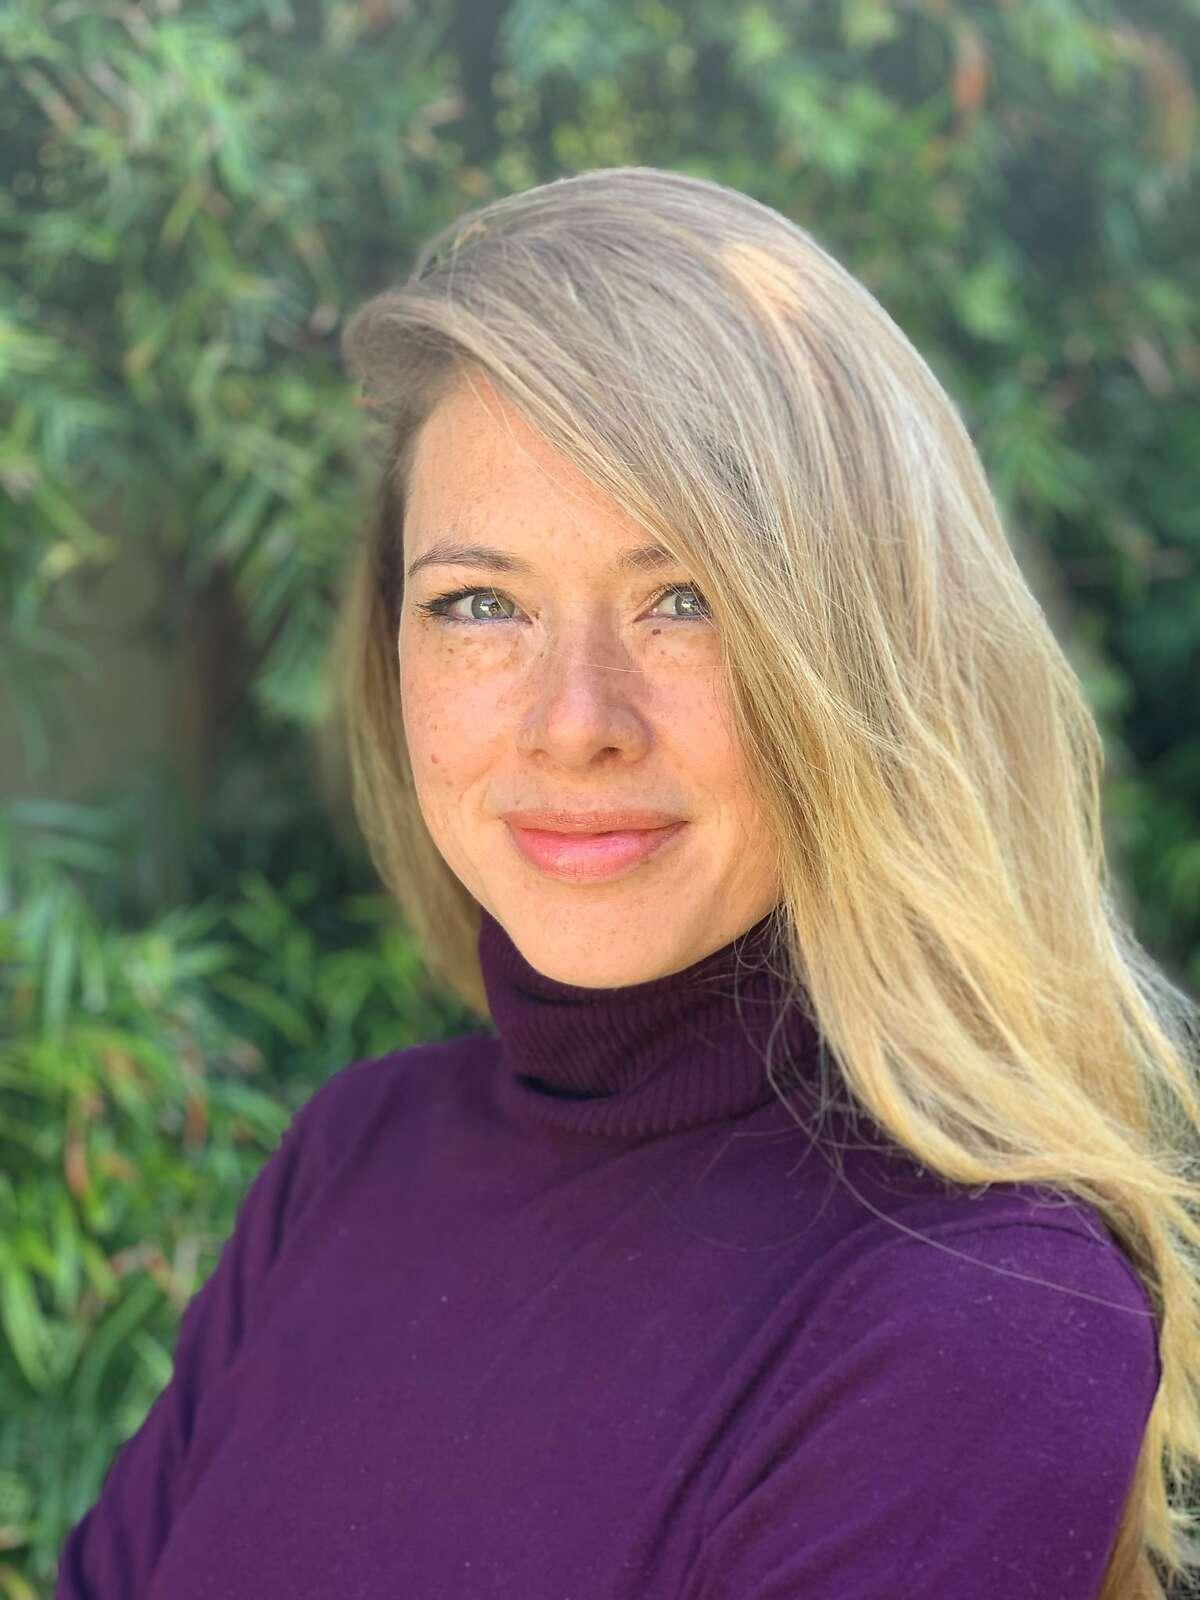 Natasha Martin, associate professor of medicine at UC San Diego School of Medicine, is leading the coronavirus testing project.